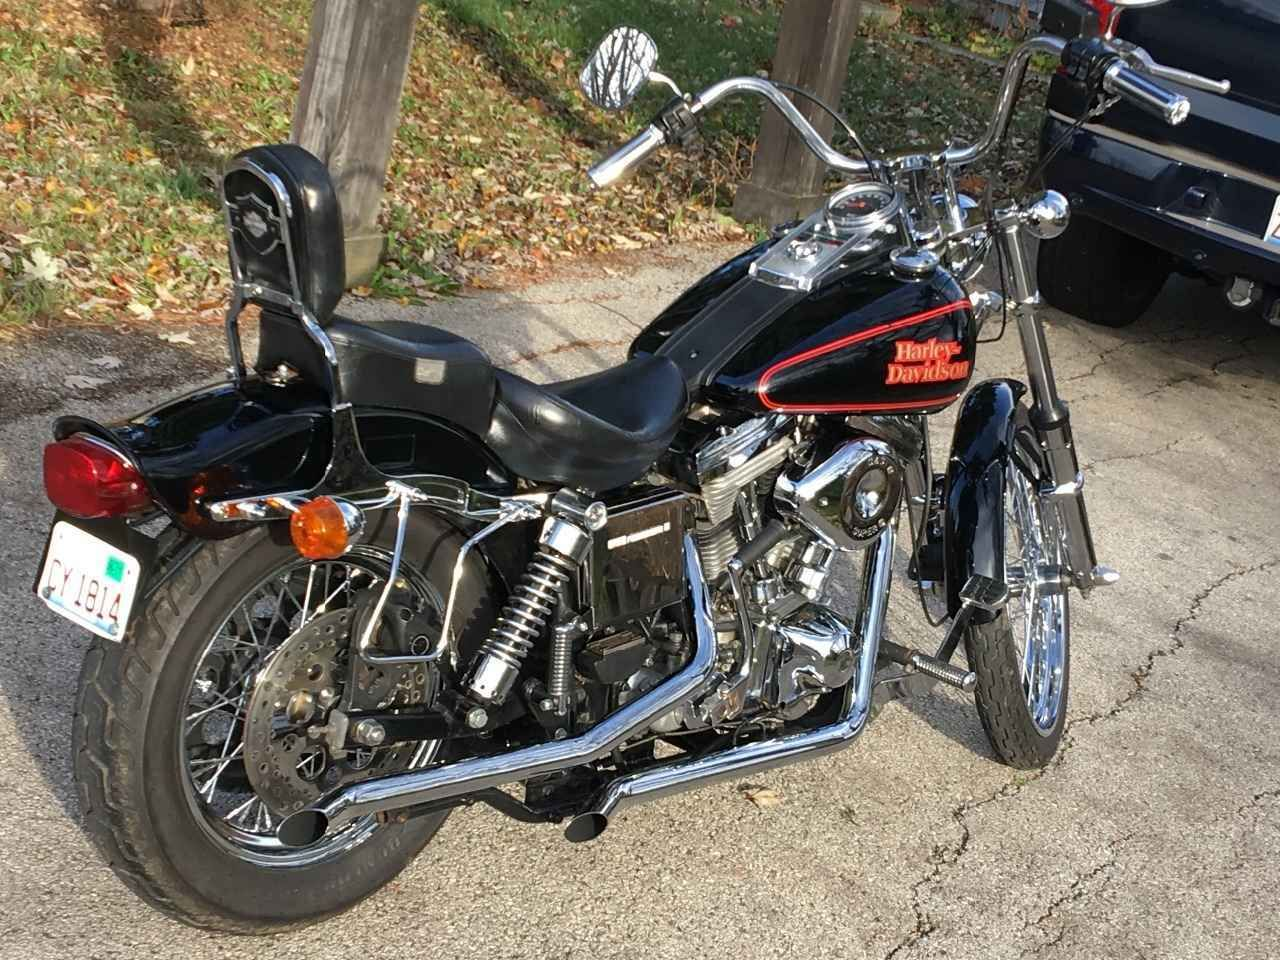 1986 Harley Davidson Softail Classic Harley Davidson Softail Harley Davidson [ 960 x 1280 Pixel ]